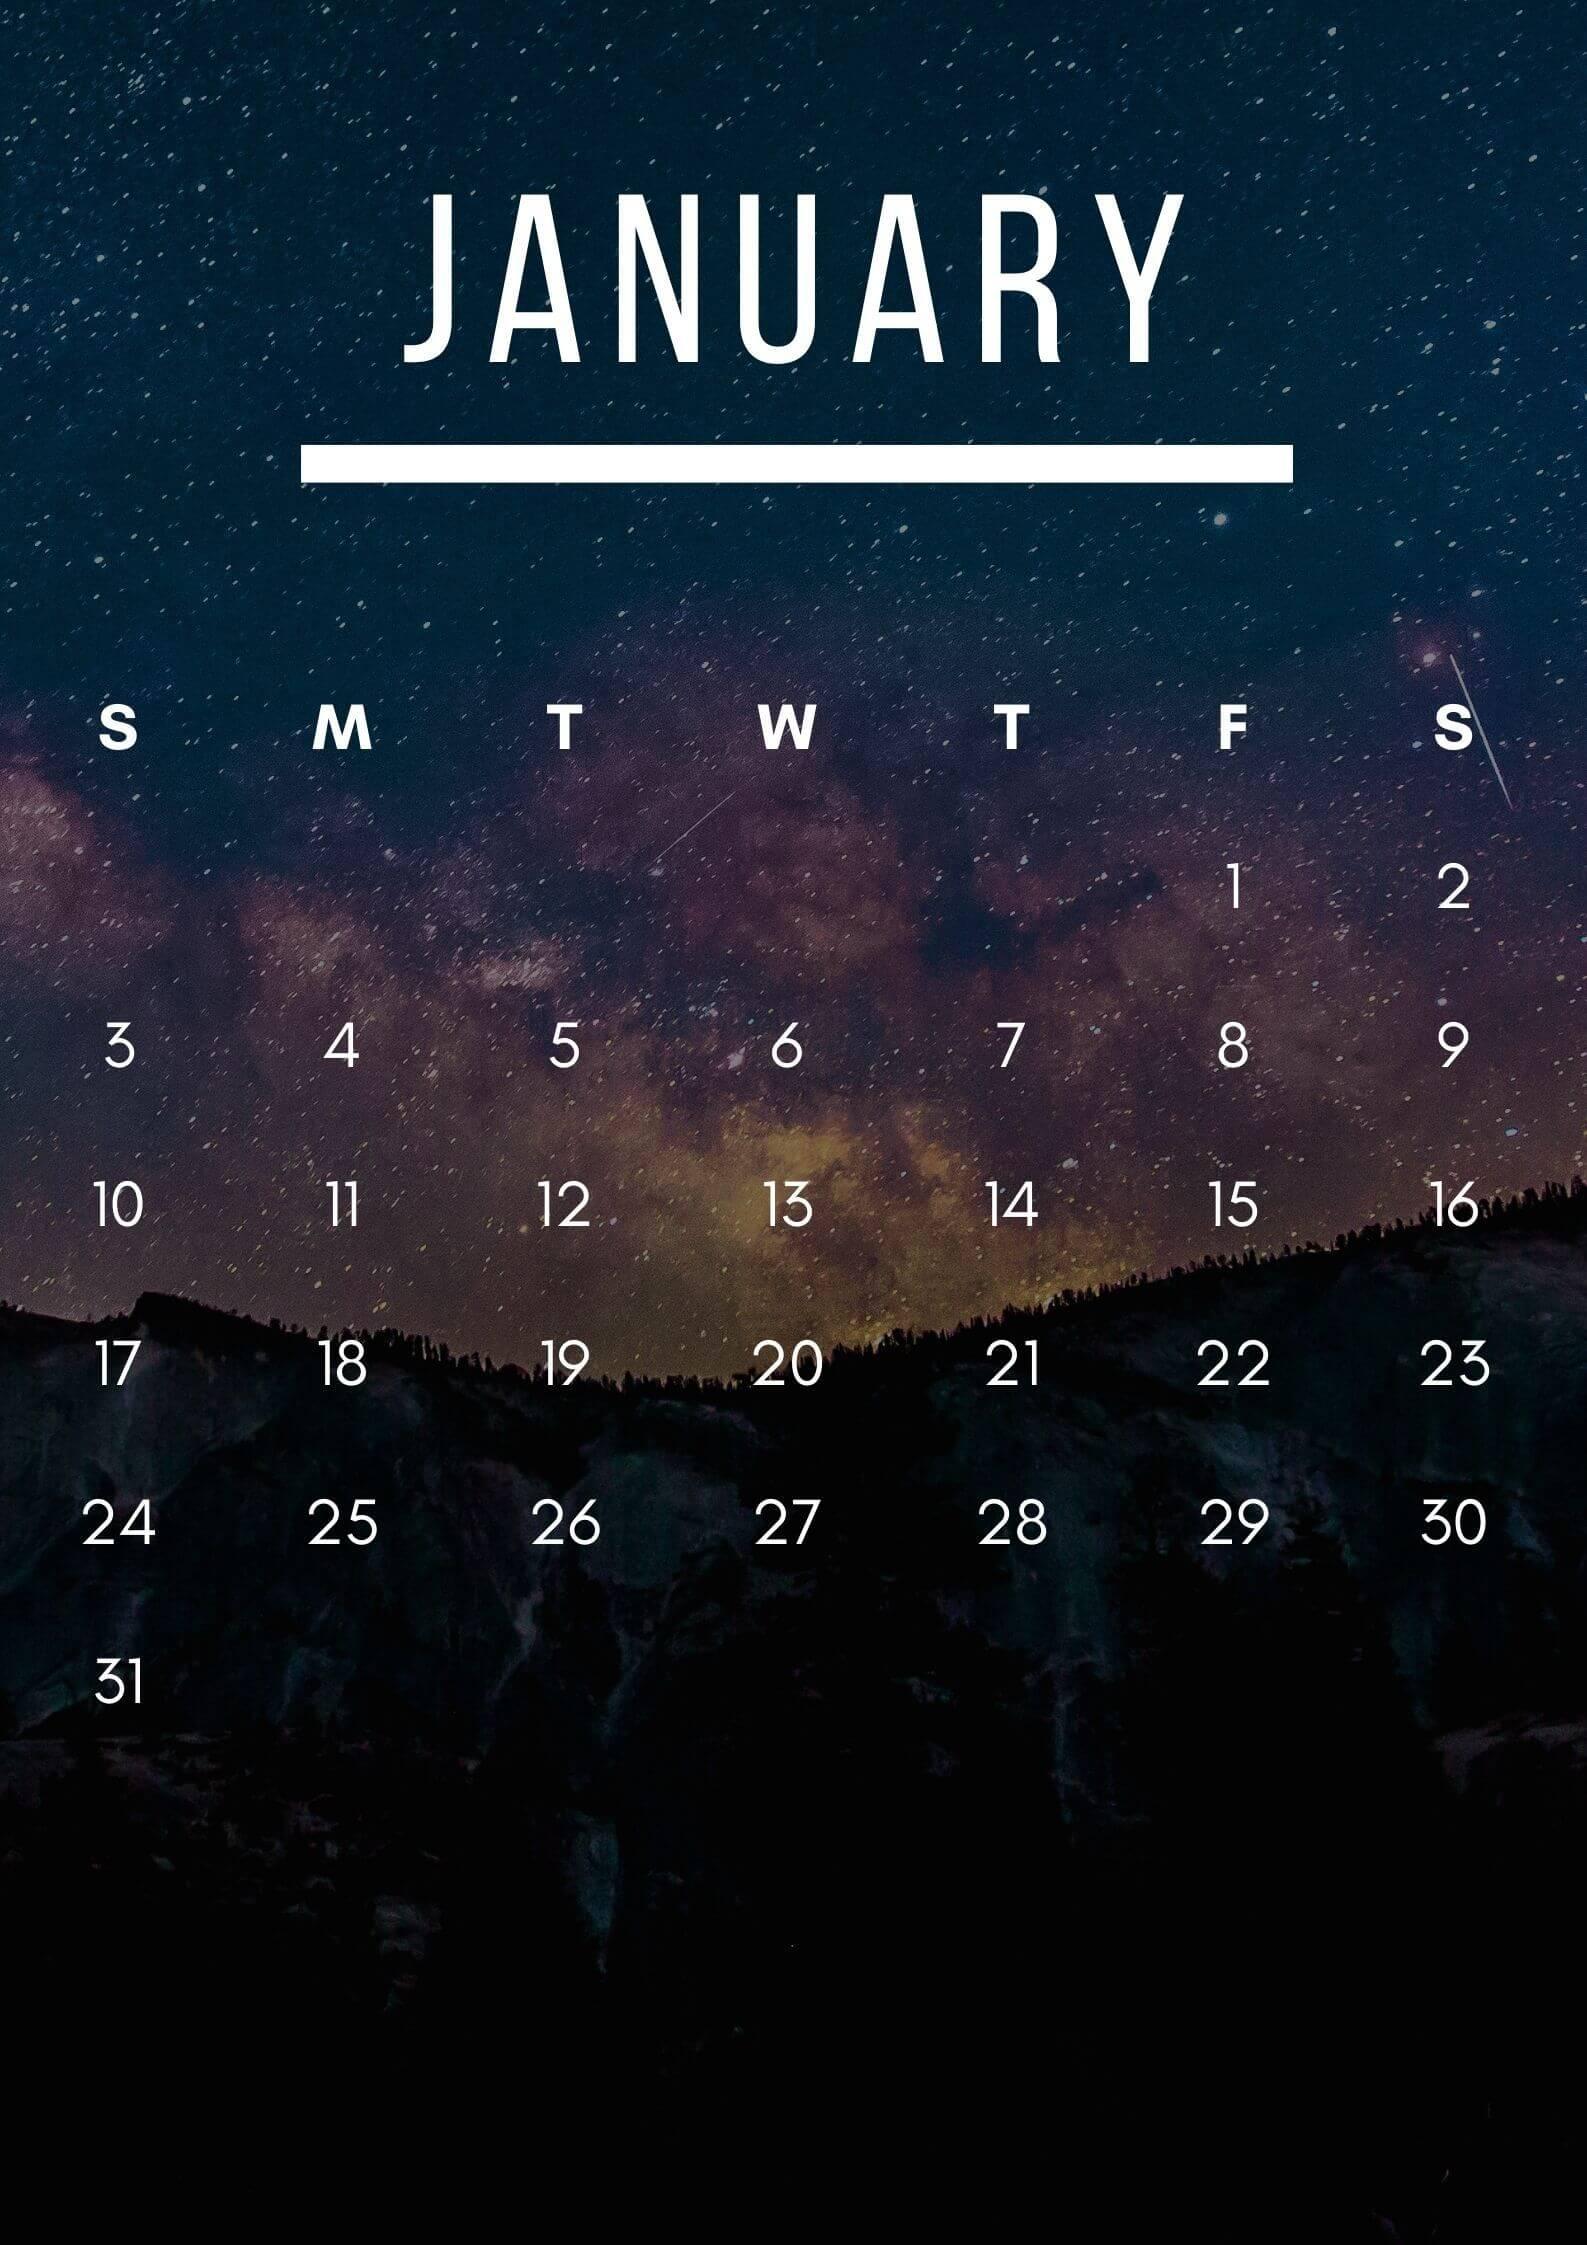 January 2021 Calendar Wallpaper For iPhone